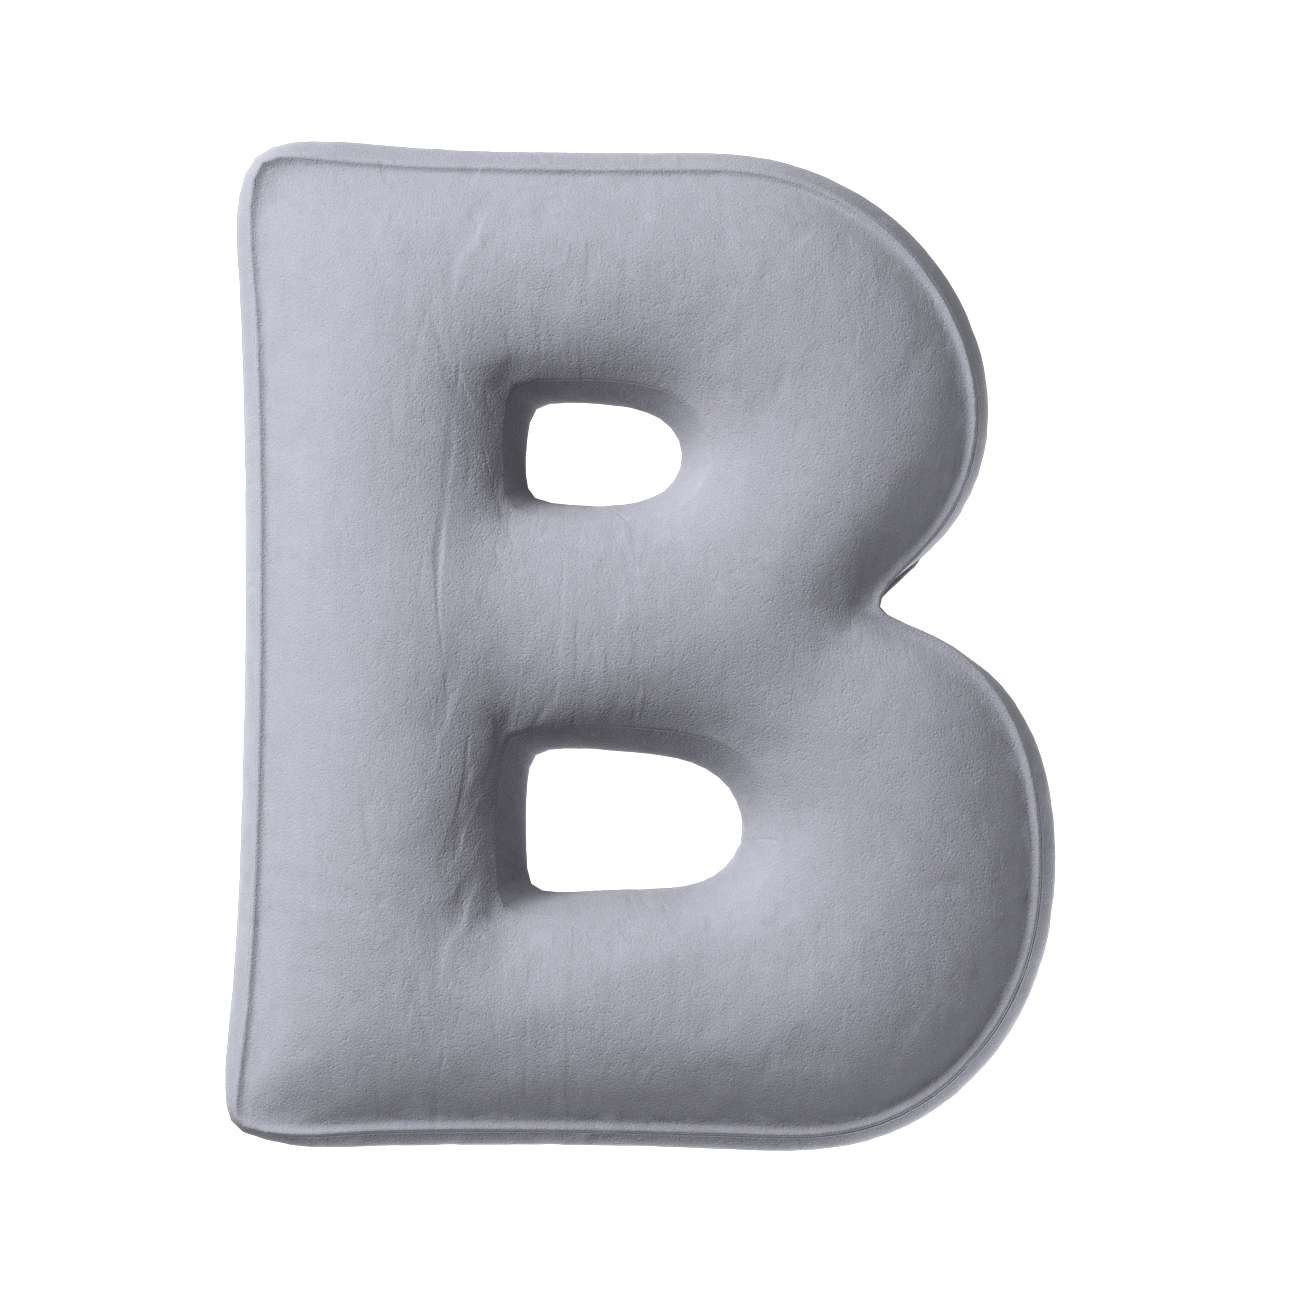 Polštář písmenko B v kolekci Posh Velvet, látka: 704-24